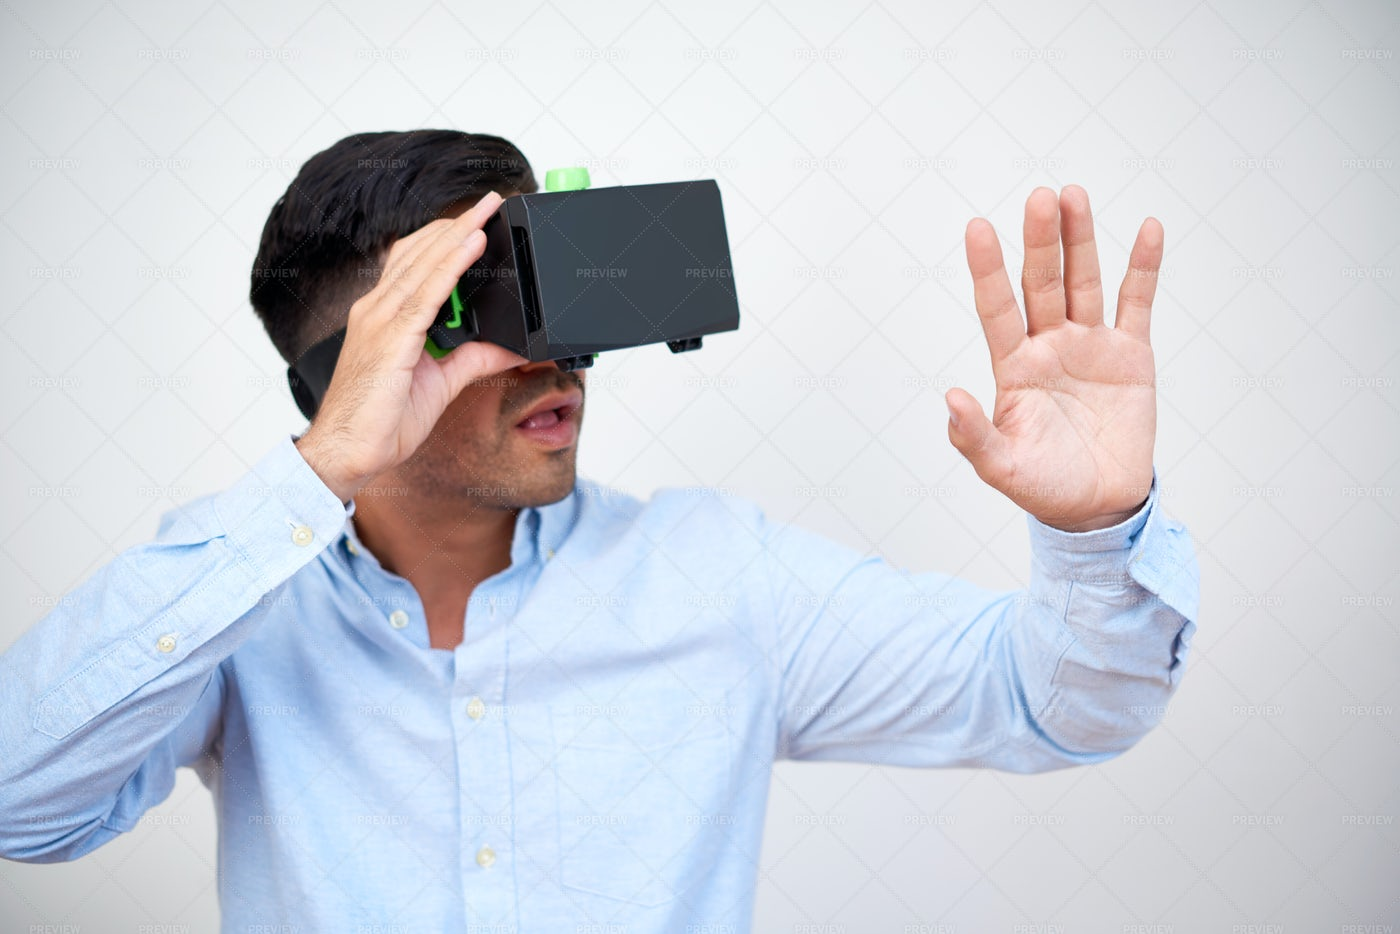 Entrepreneur In VR Headset Watching: Stock Photos